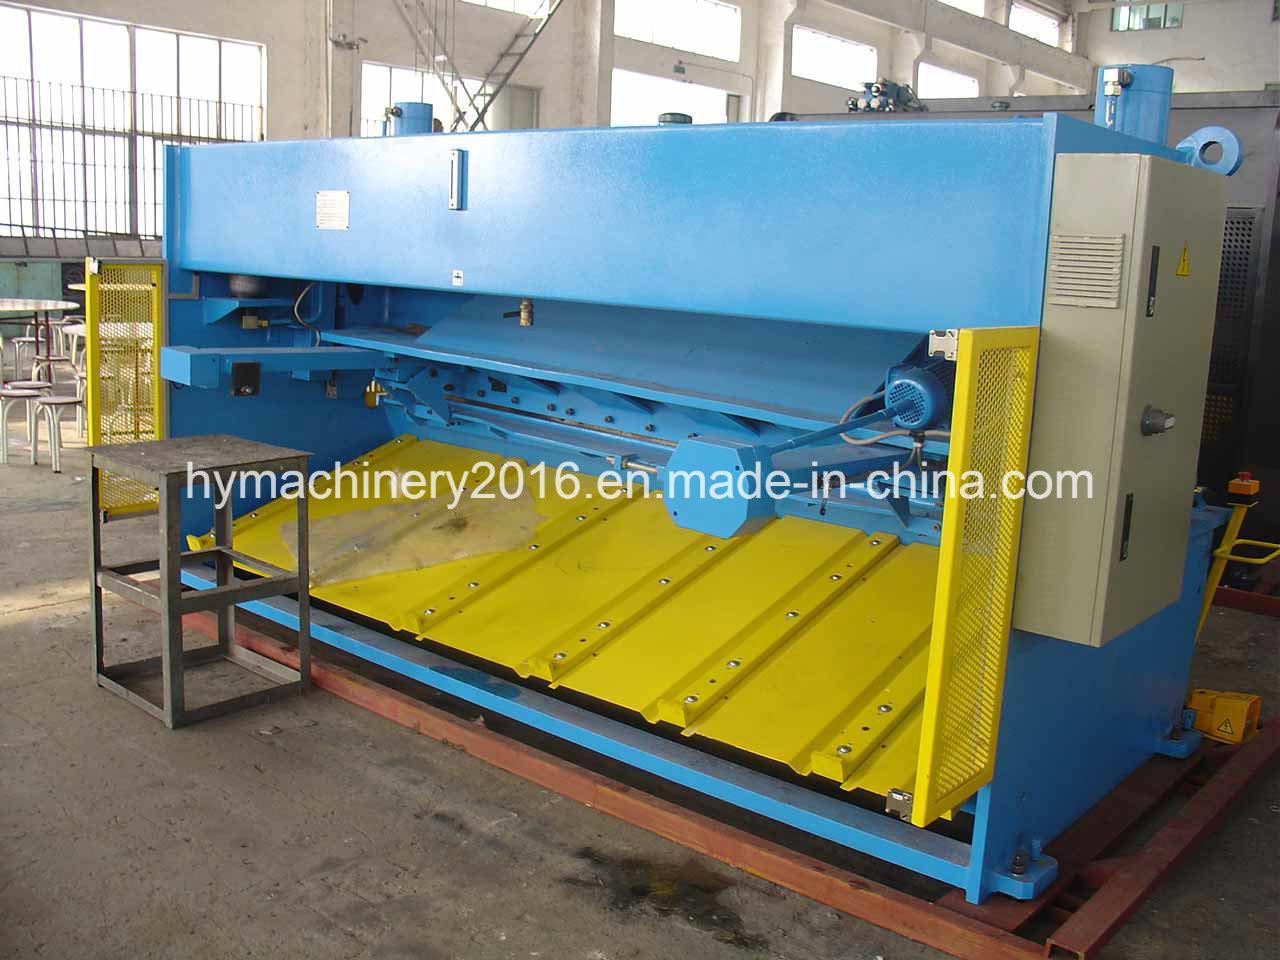 QC11y-12X2500 E21s Control Hydraulic Guillotine Shearing Machinery